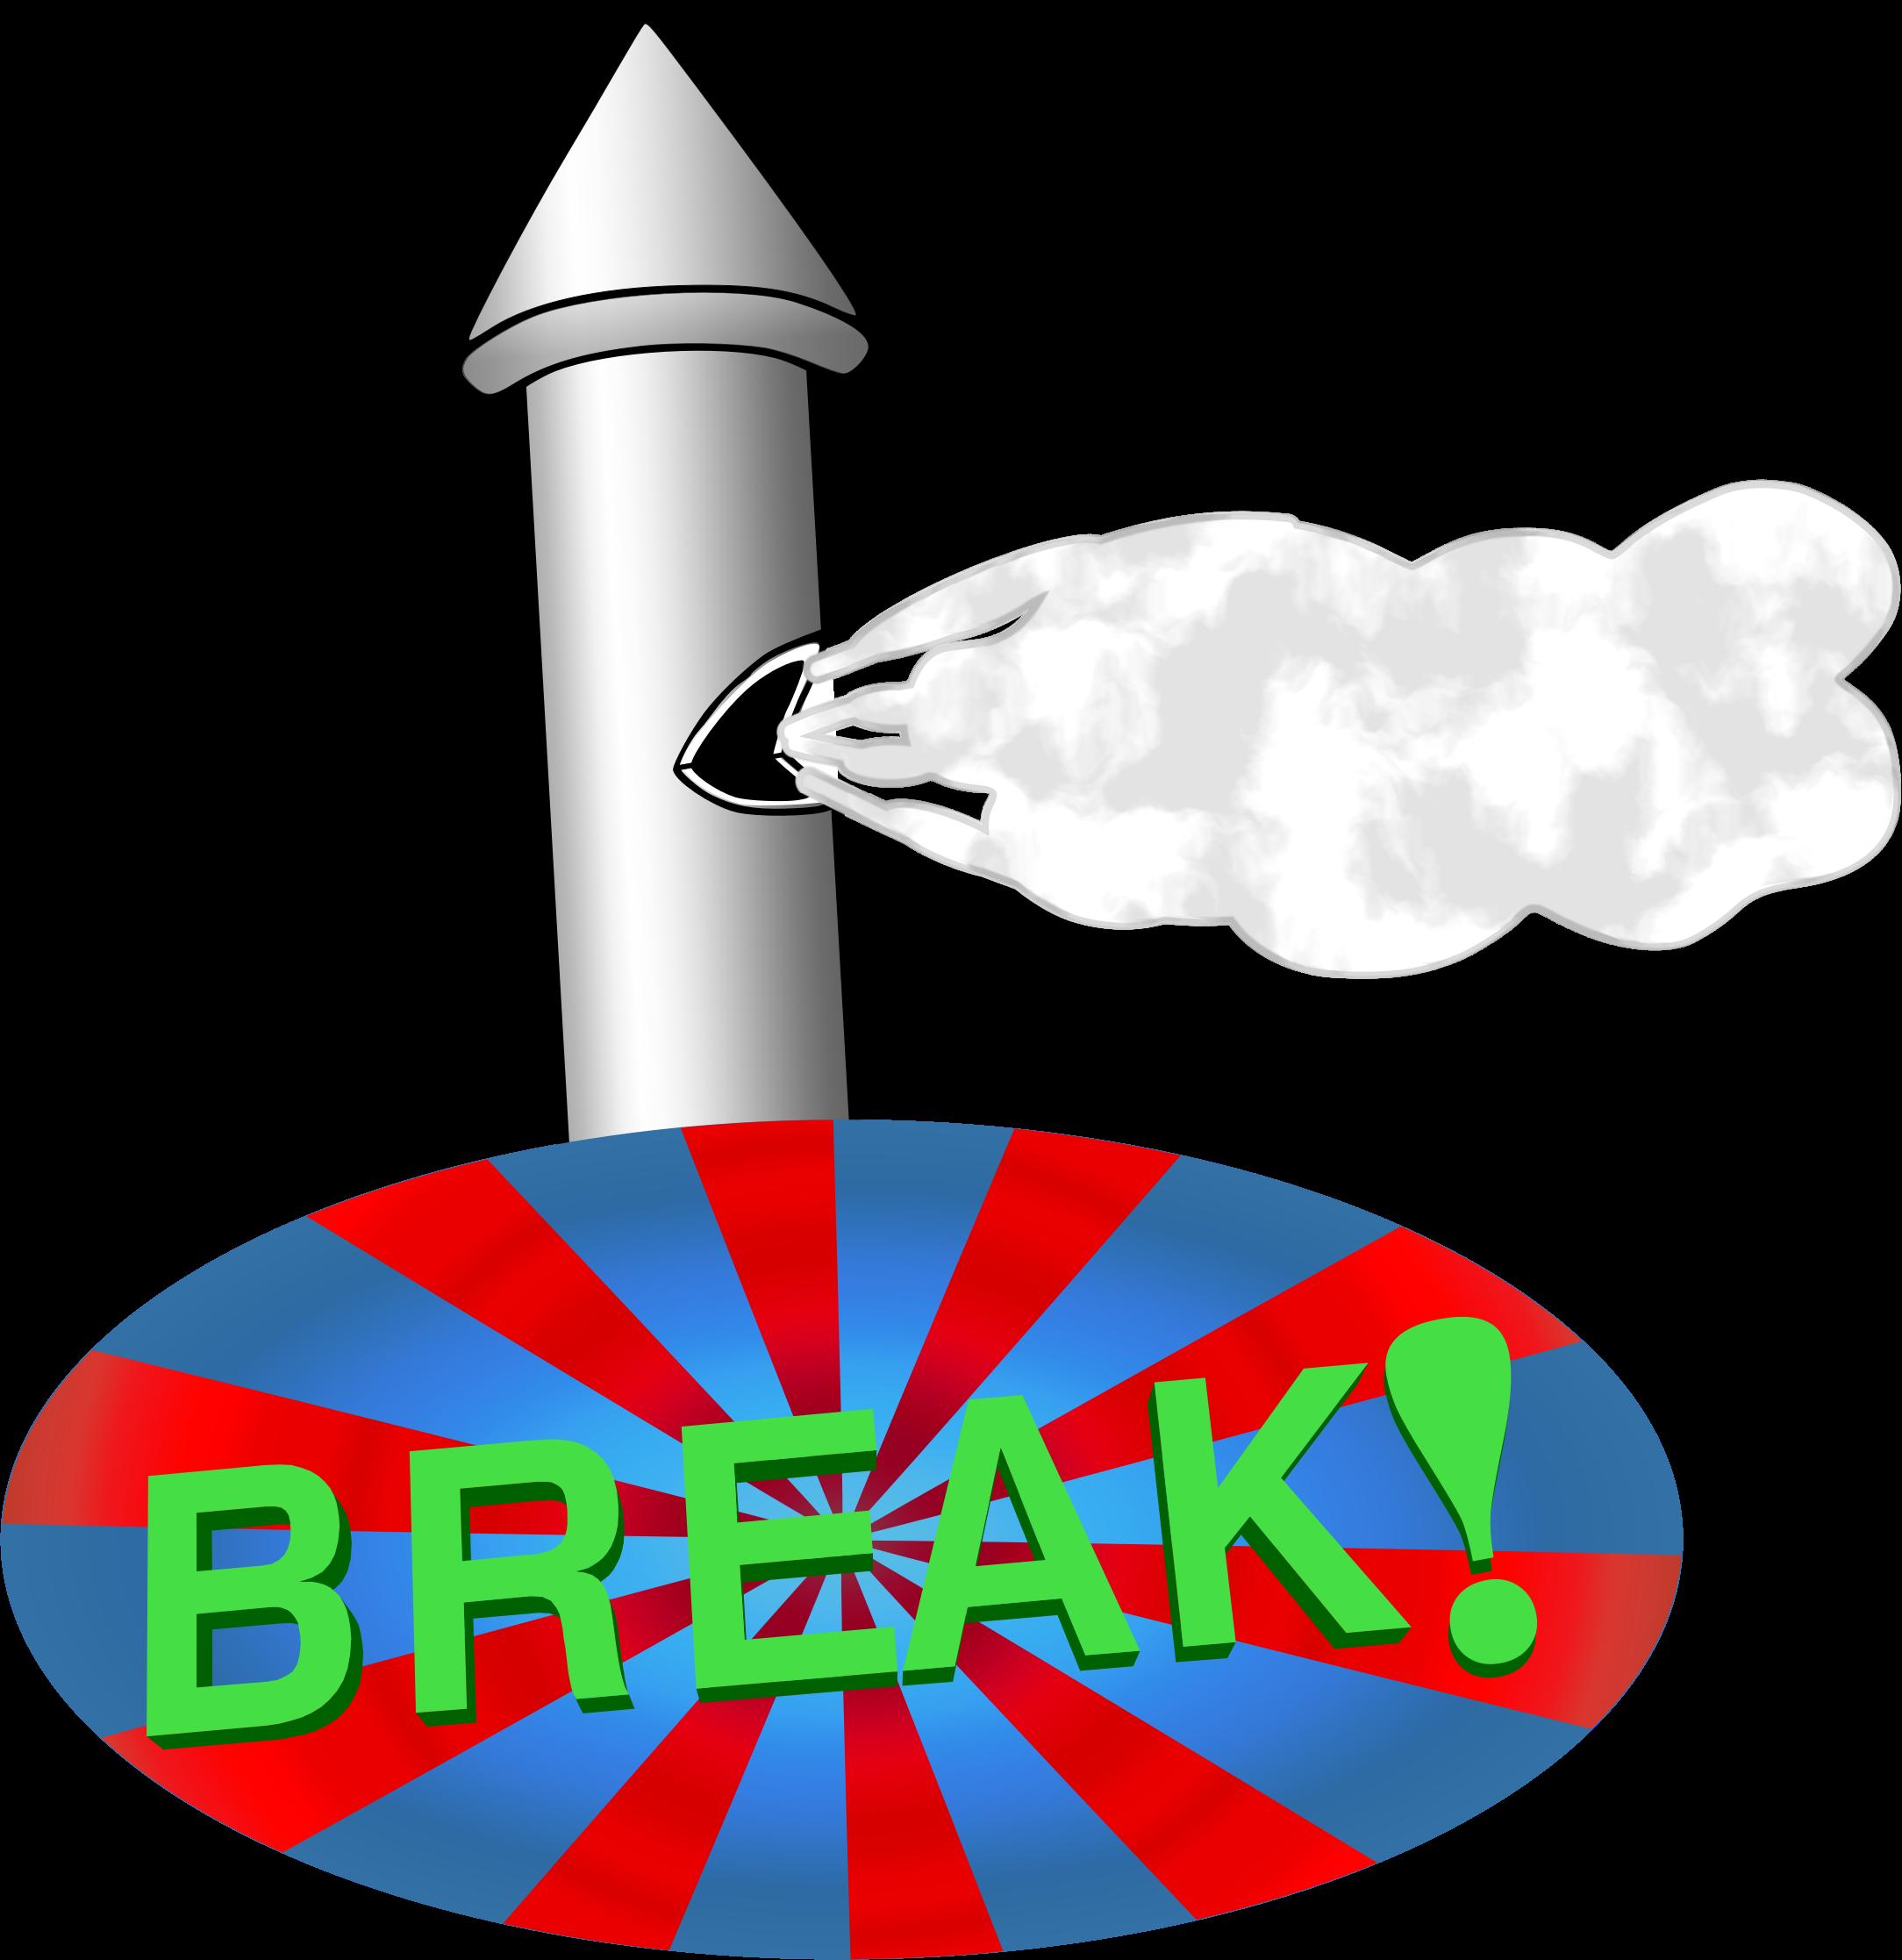 svg freeuse stock Break time big image. Lunch clipart breaktime.